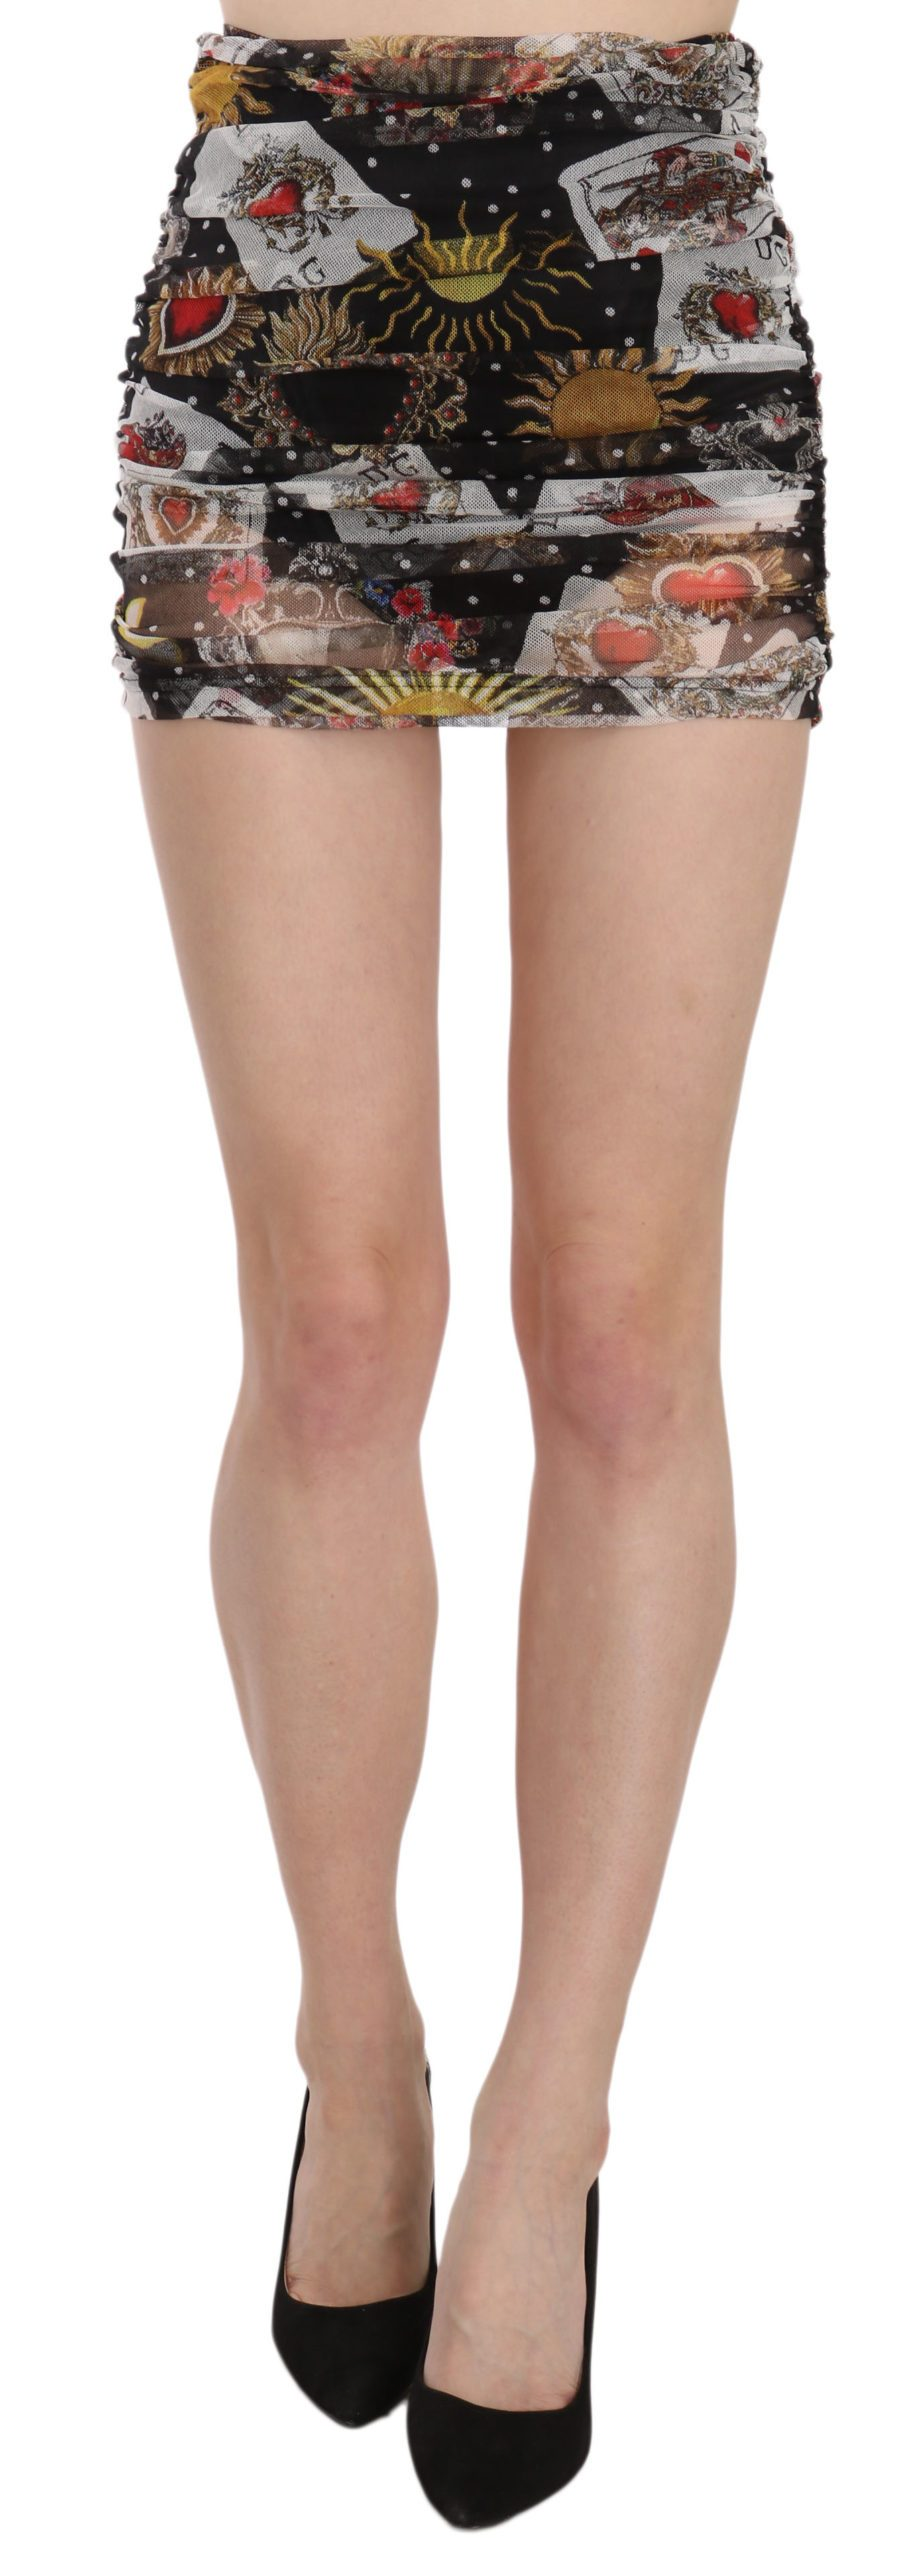 Dolce & Gabbana Women's Deck Of Cards Micro Skirt Black SKI1328 - IT40 S